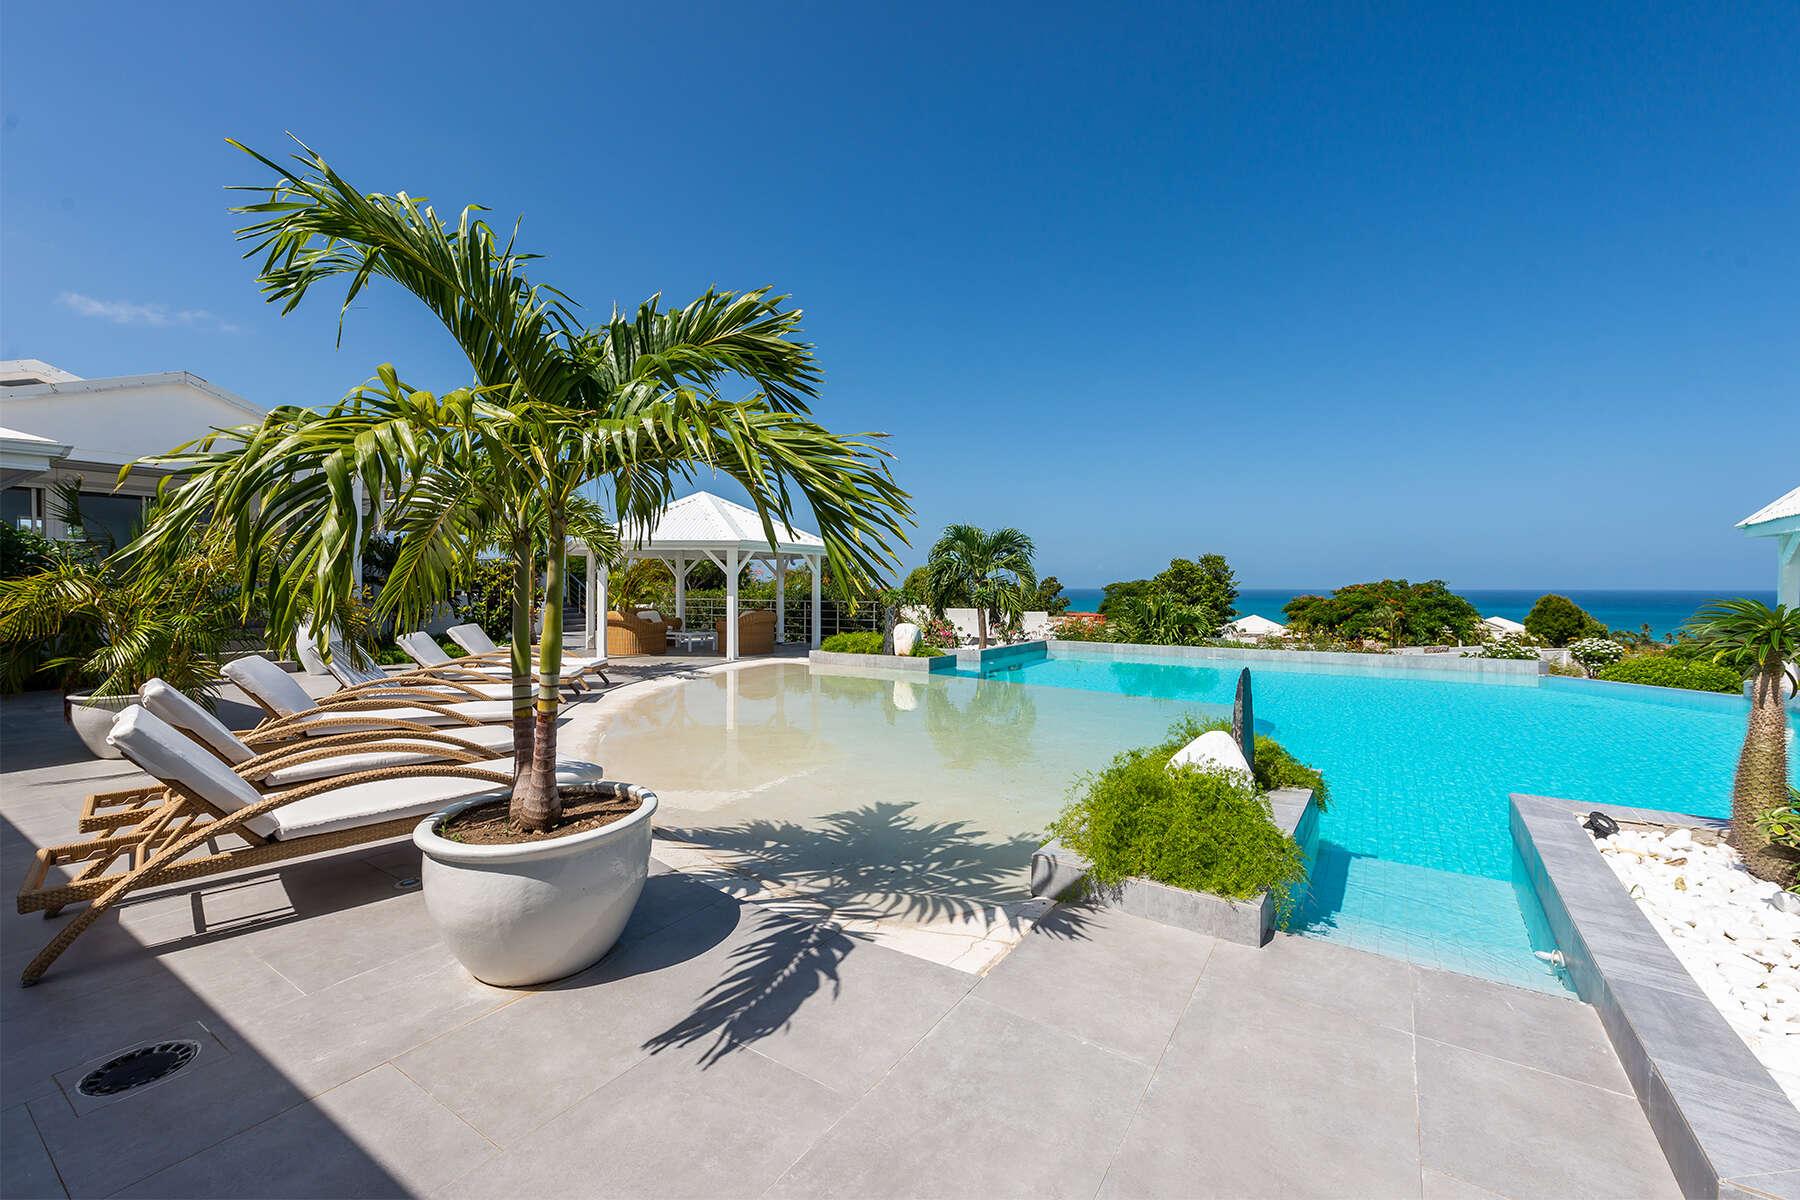 Luxury villa rentals caribbean - St martin - Saint martin french - Les terres basses - Mandalay - Image 1/30